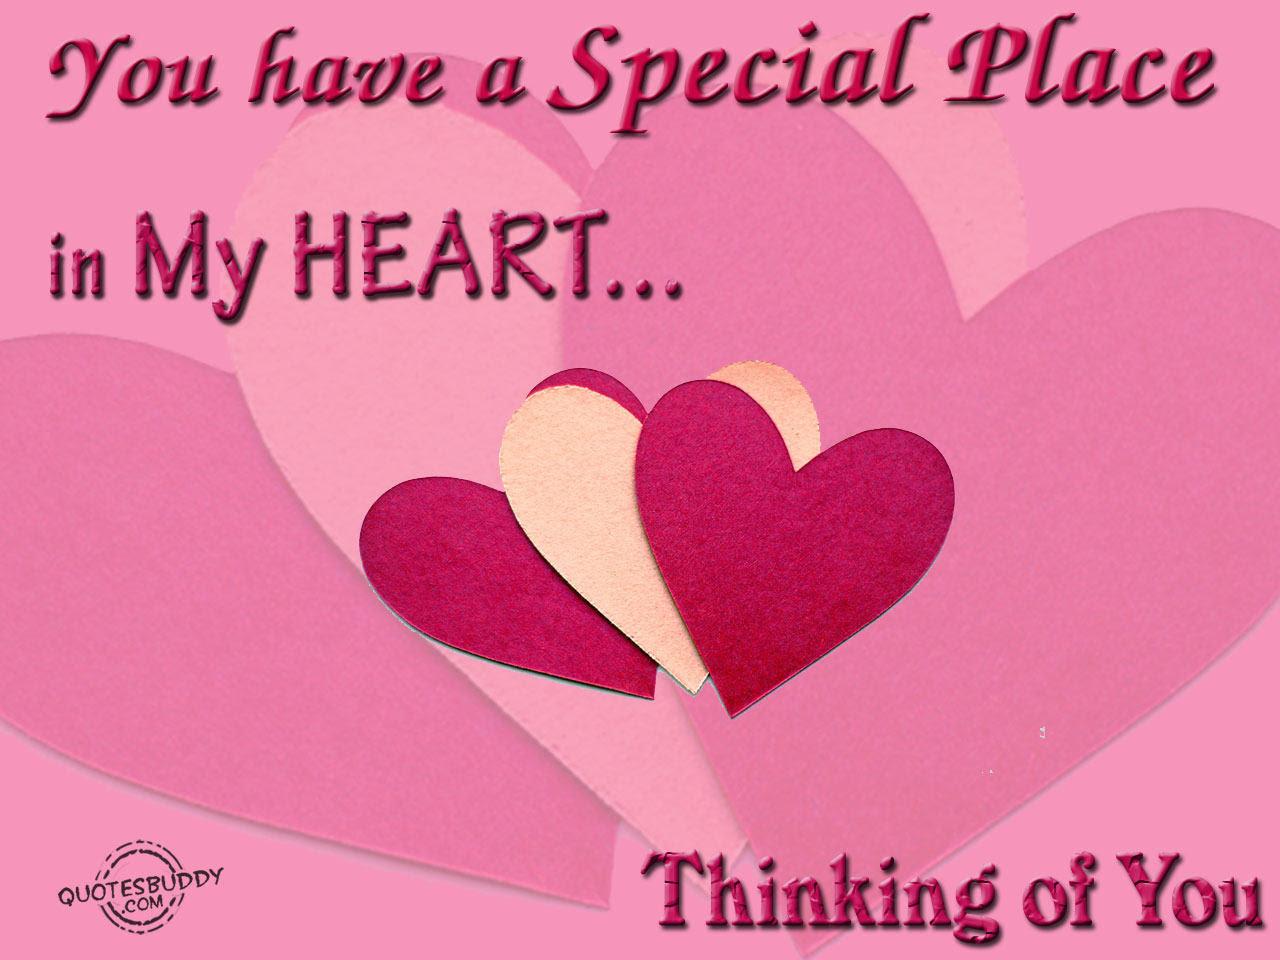 Love You Babe Quotes Quotes Love You Babe Love Quotes